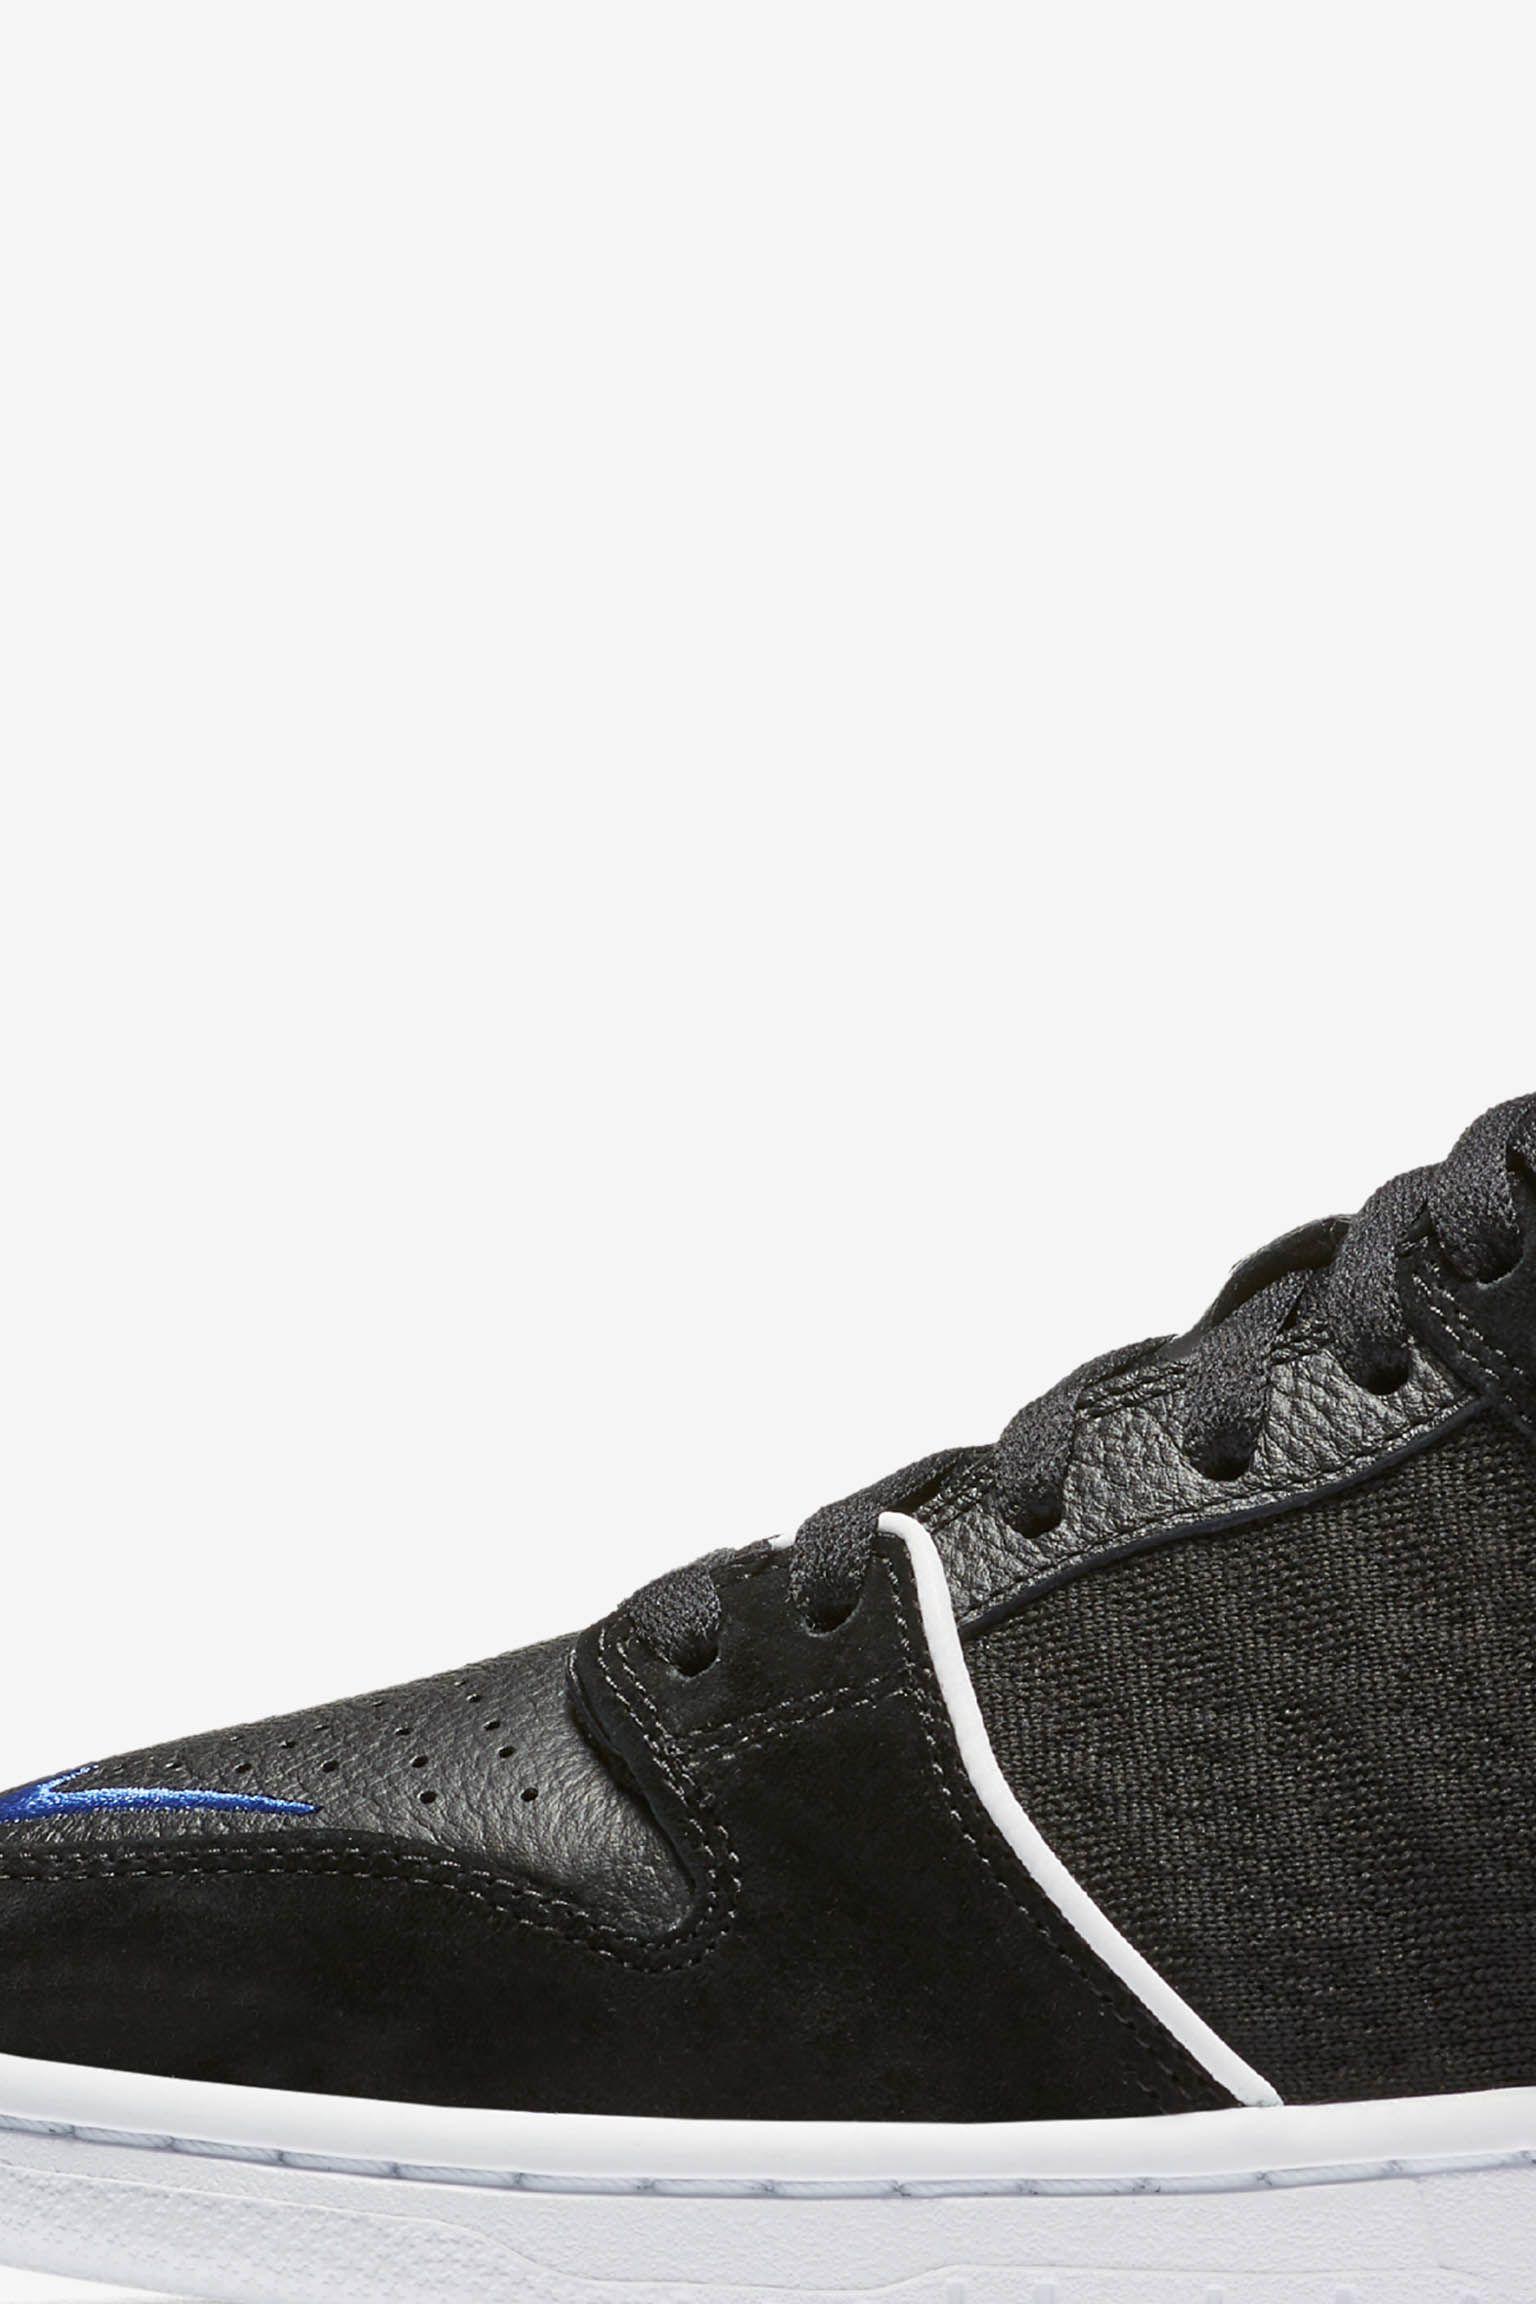 Nike SB Zoom Dunk Low Pro 'Soulland' Release Date